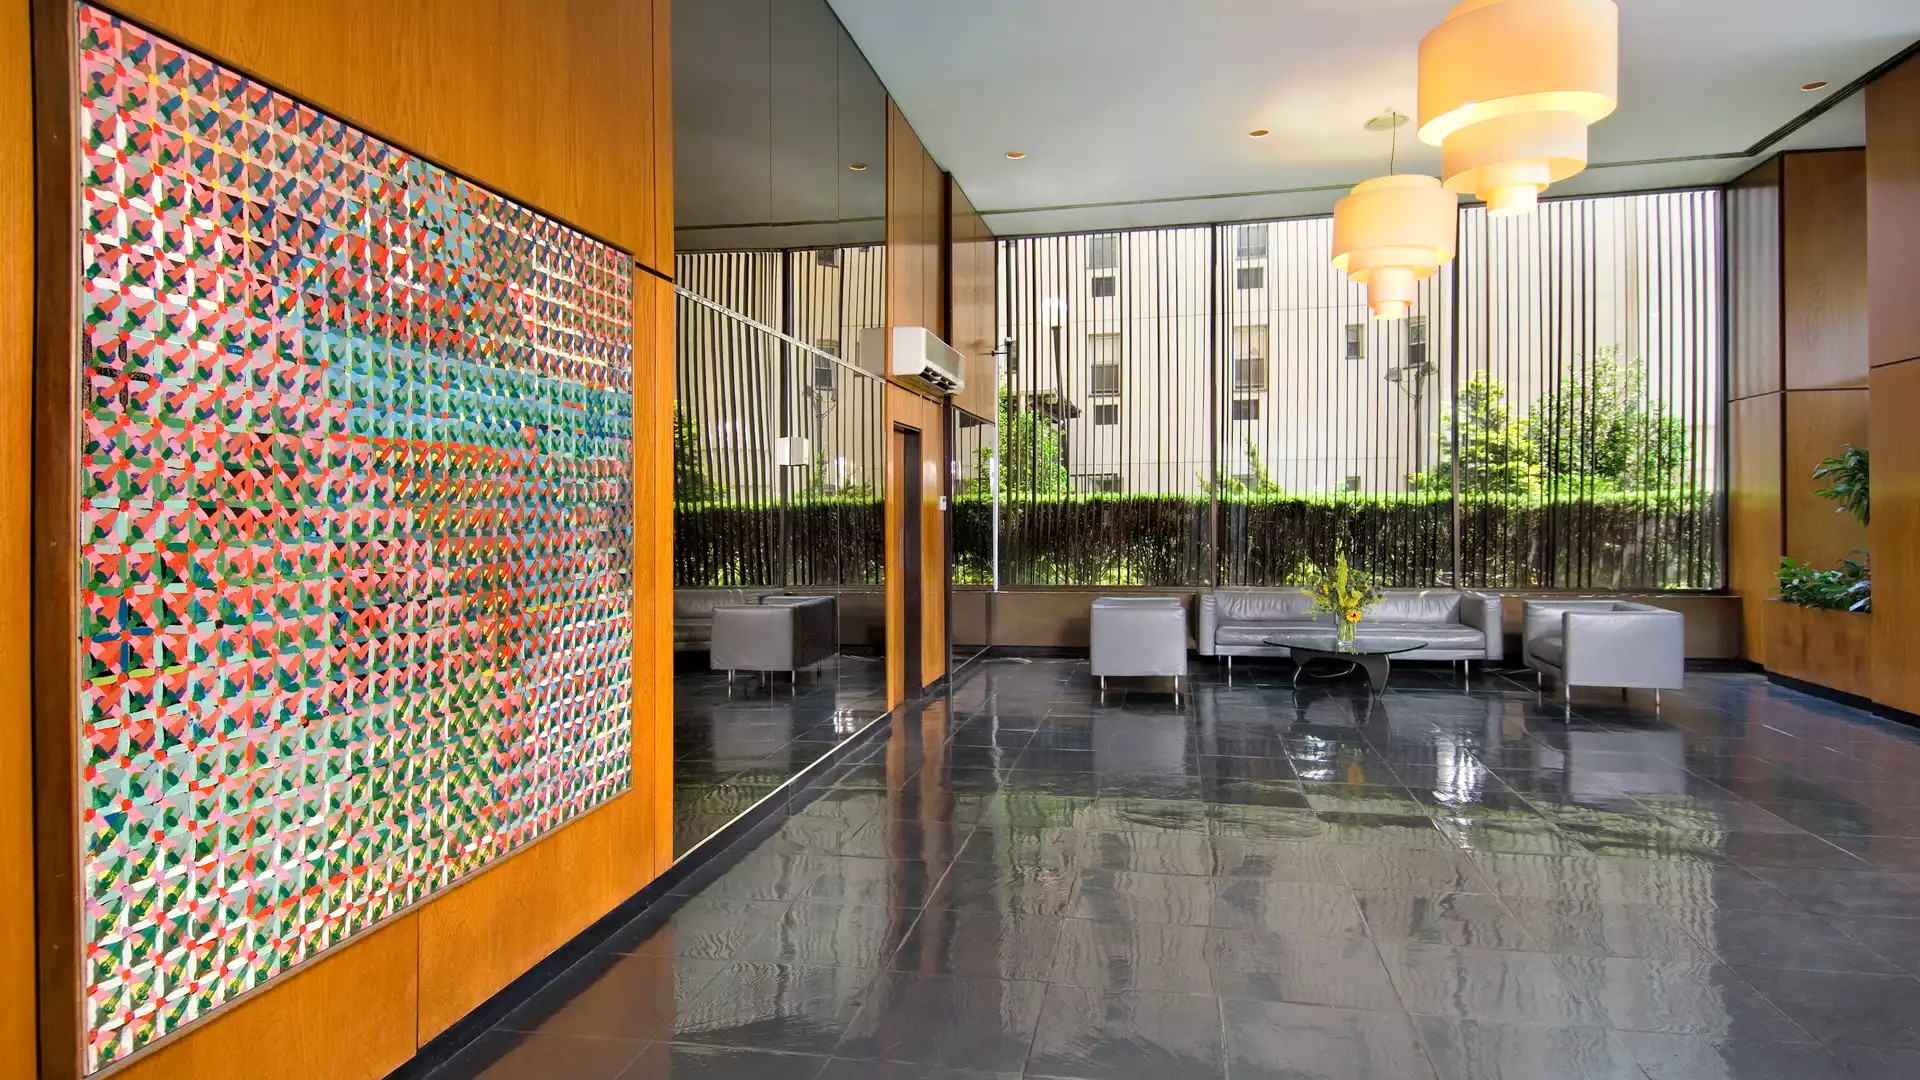 303 East 83rd Apartments - New York, NY